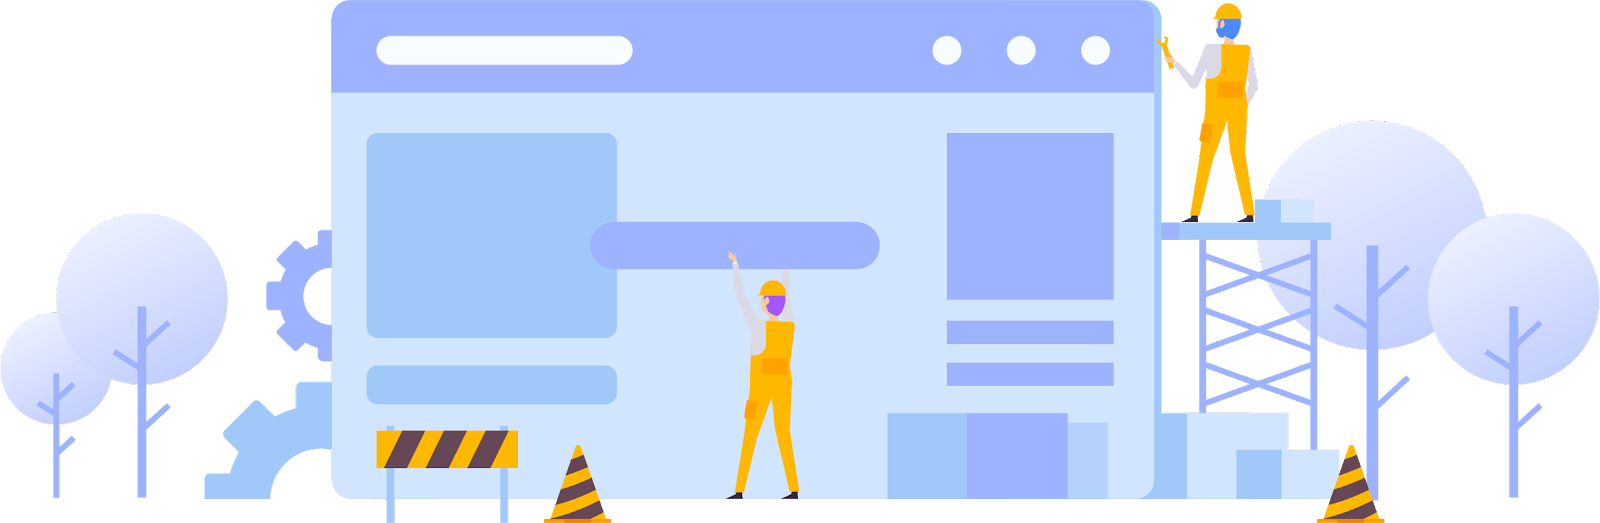 Page builders | BGNBuzz